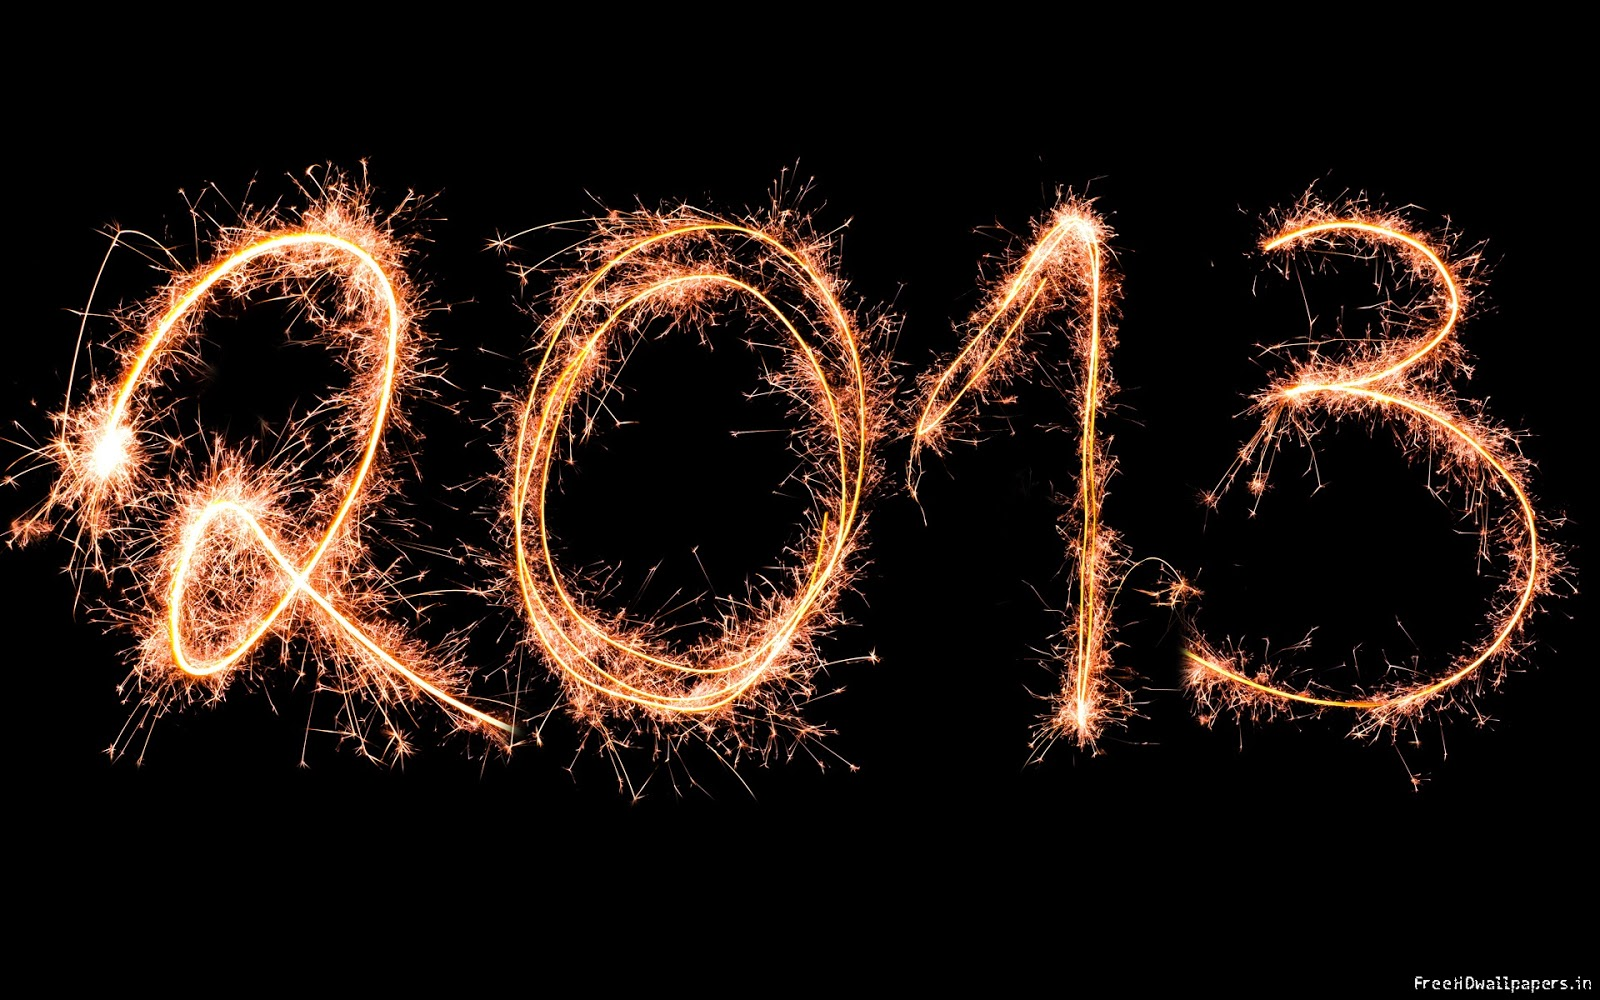 wallpaper world: happy new year 2013